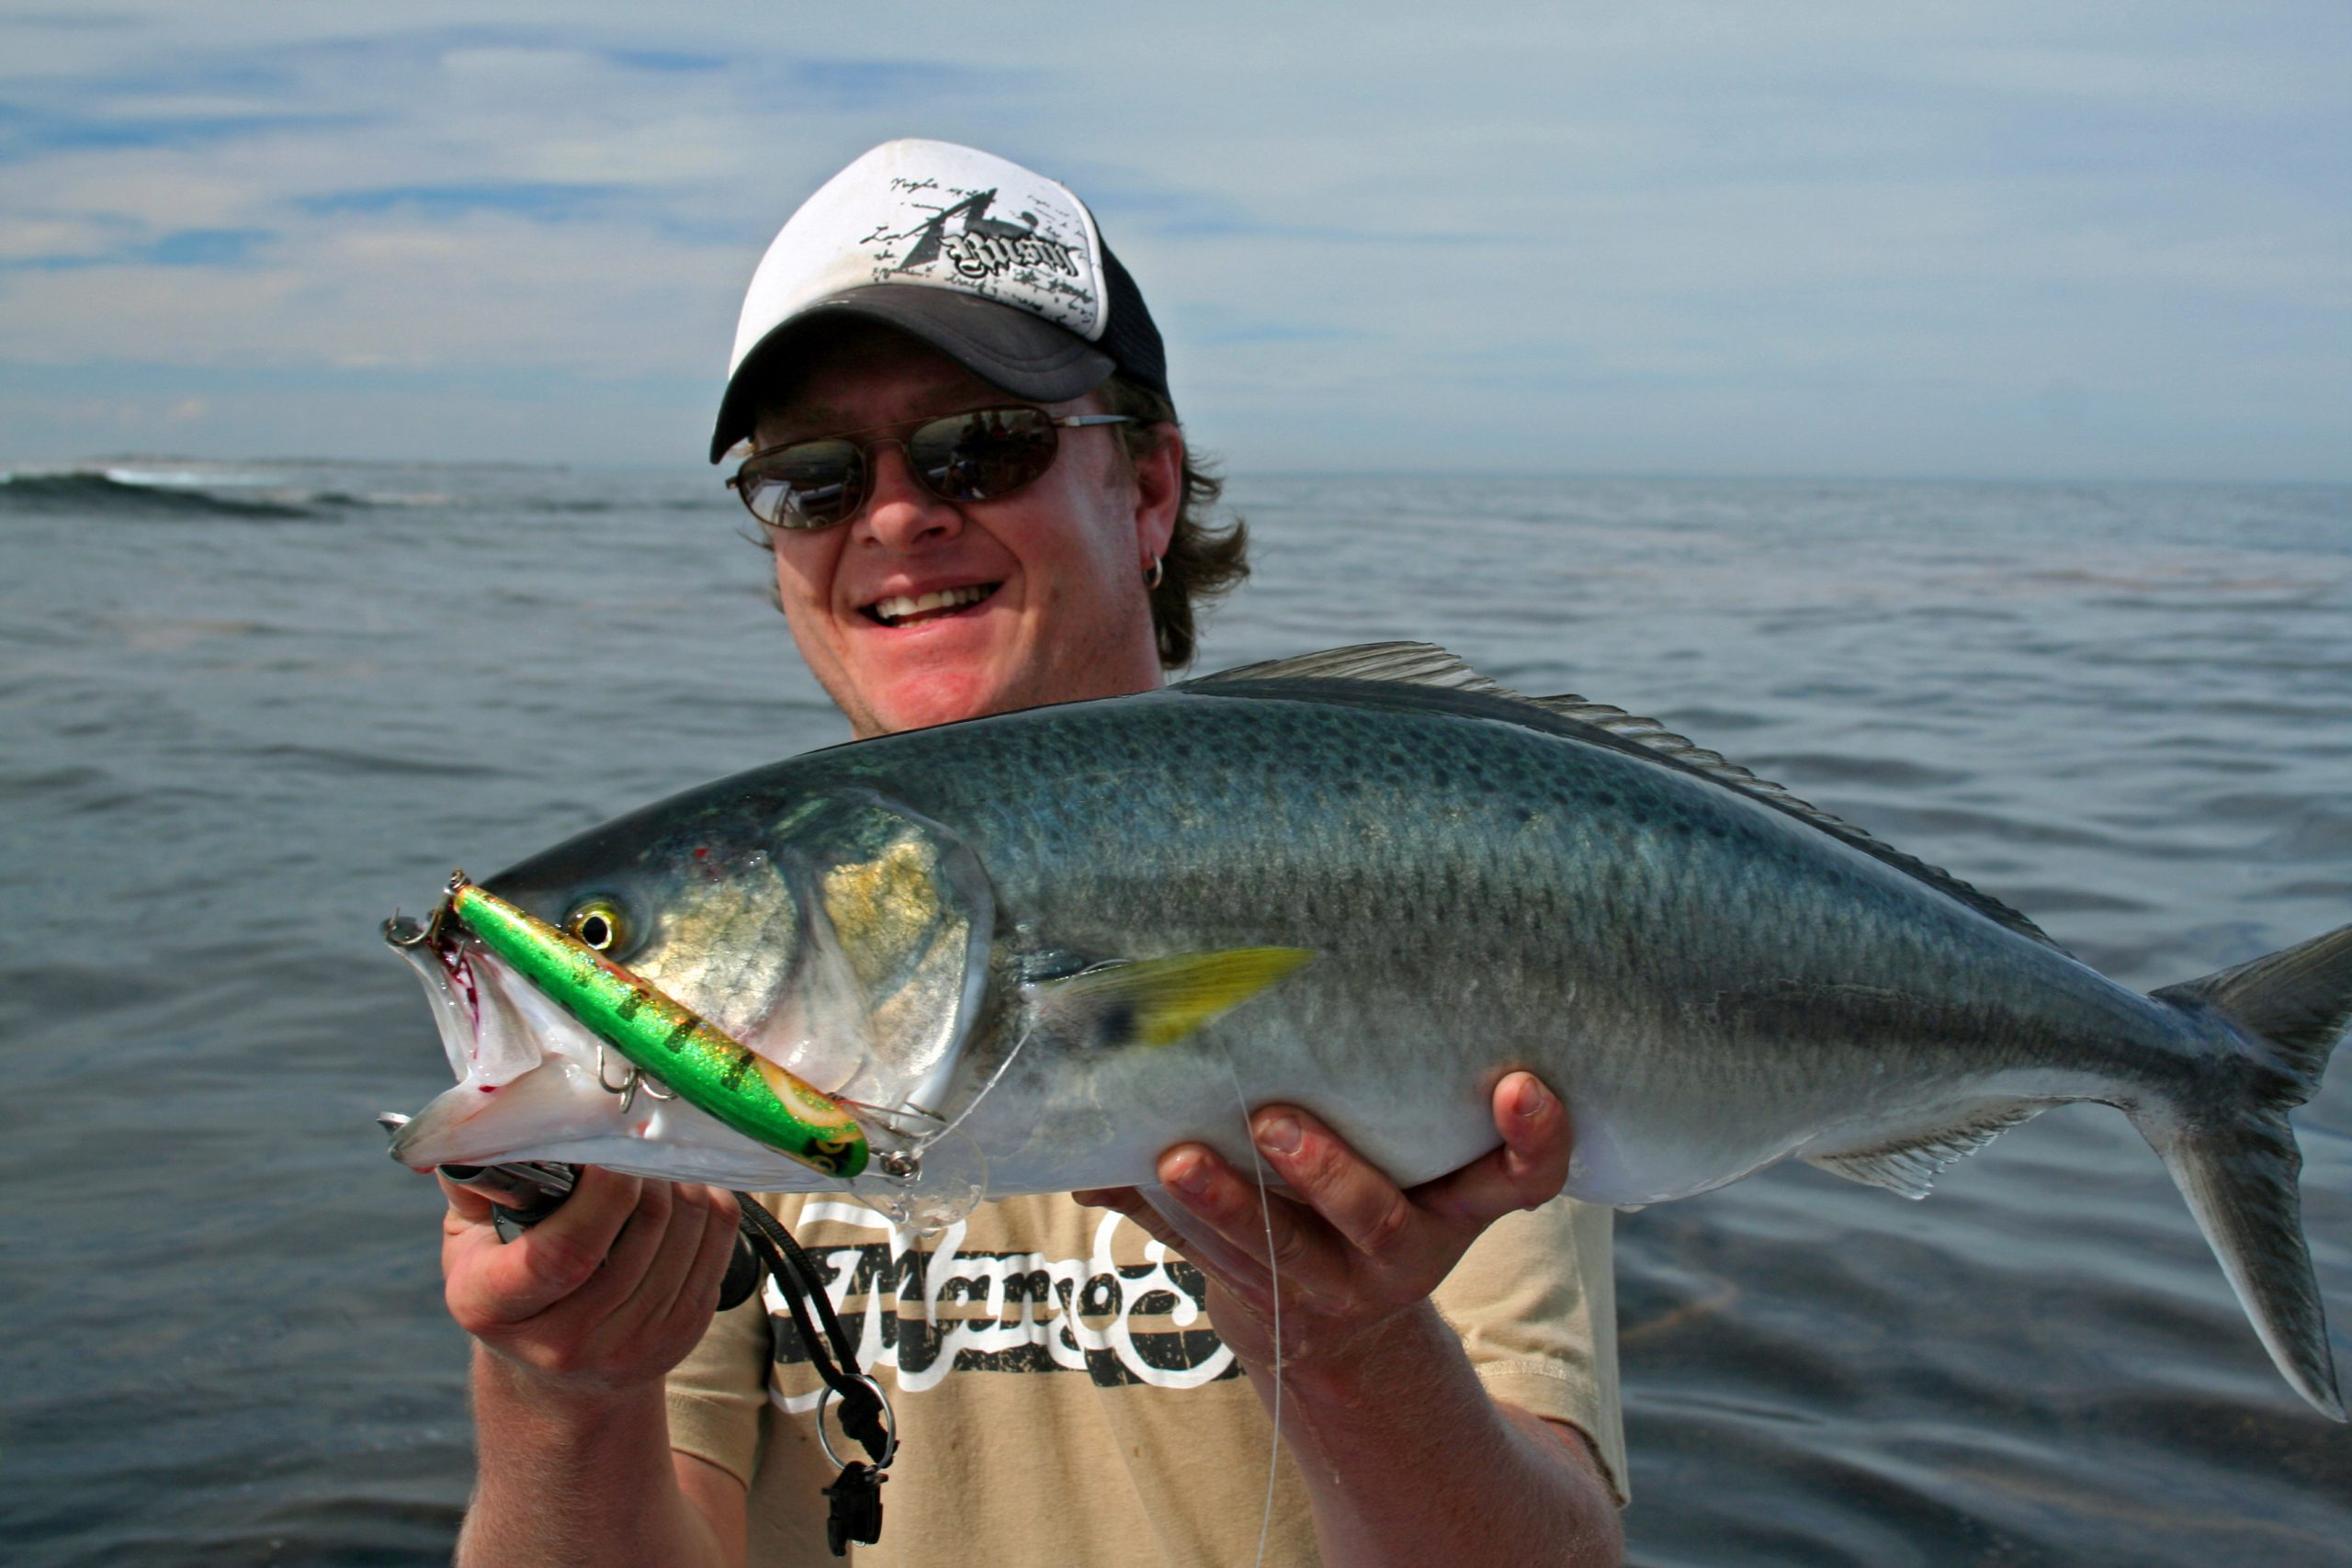 Steve Correia with Rottnest Island Salmon